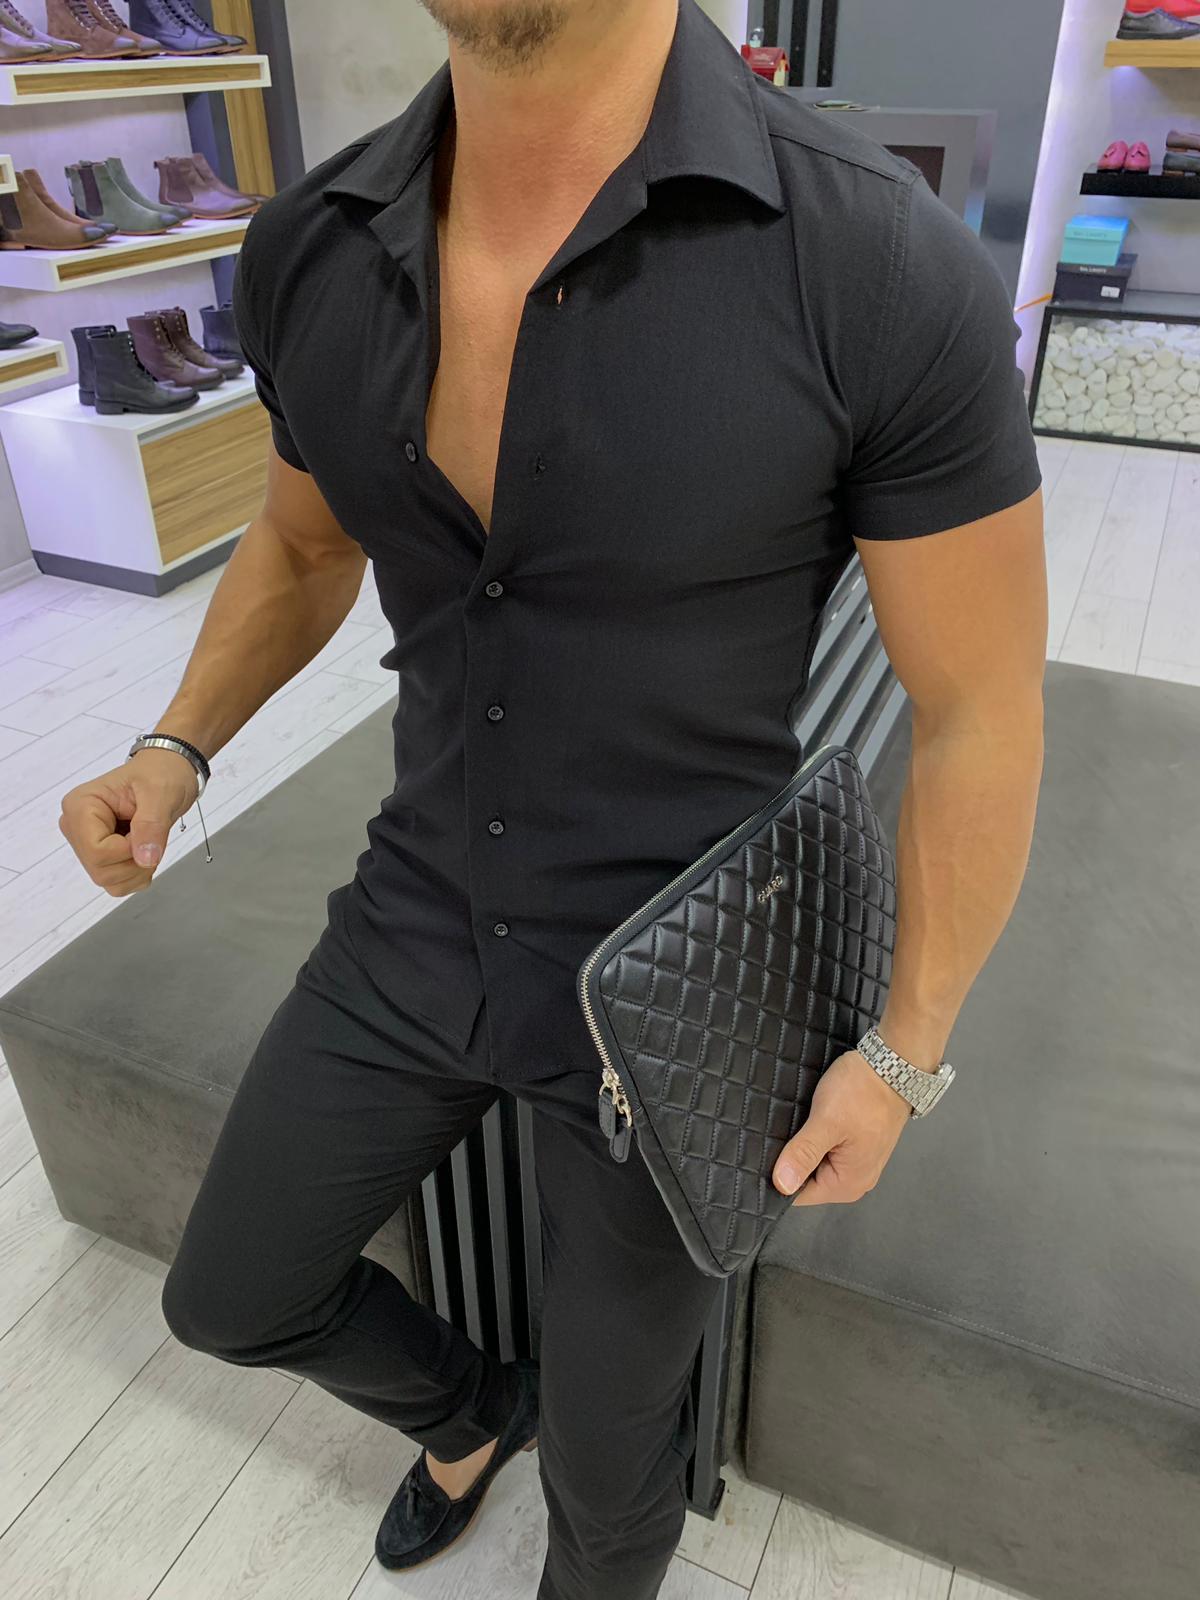 668ca872f768 Μαυρο ανδρικό πουκάμισο super slim